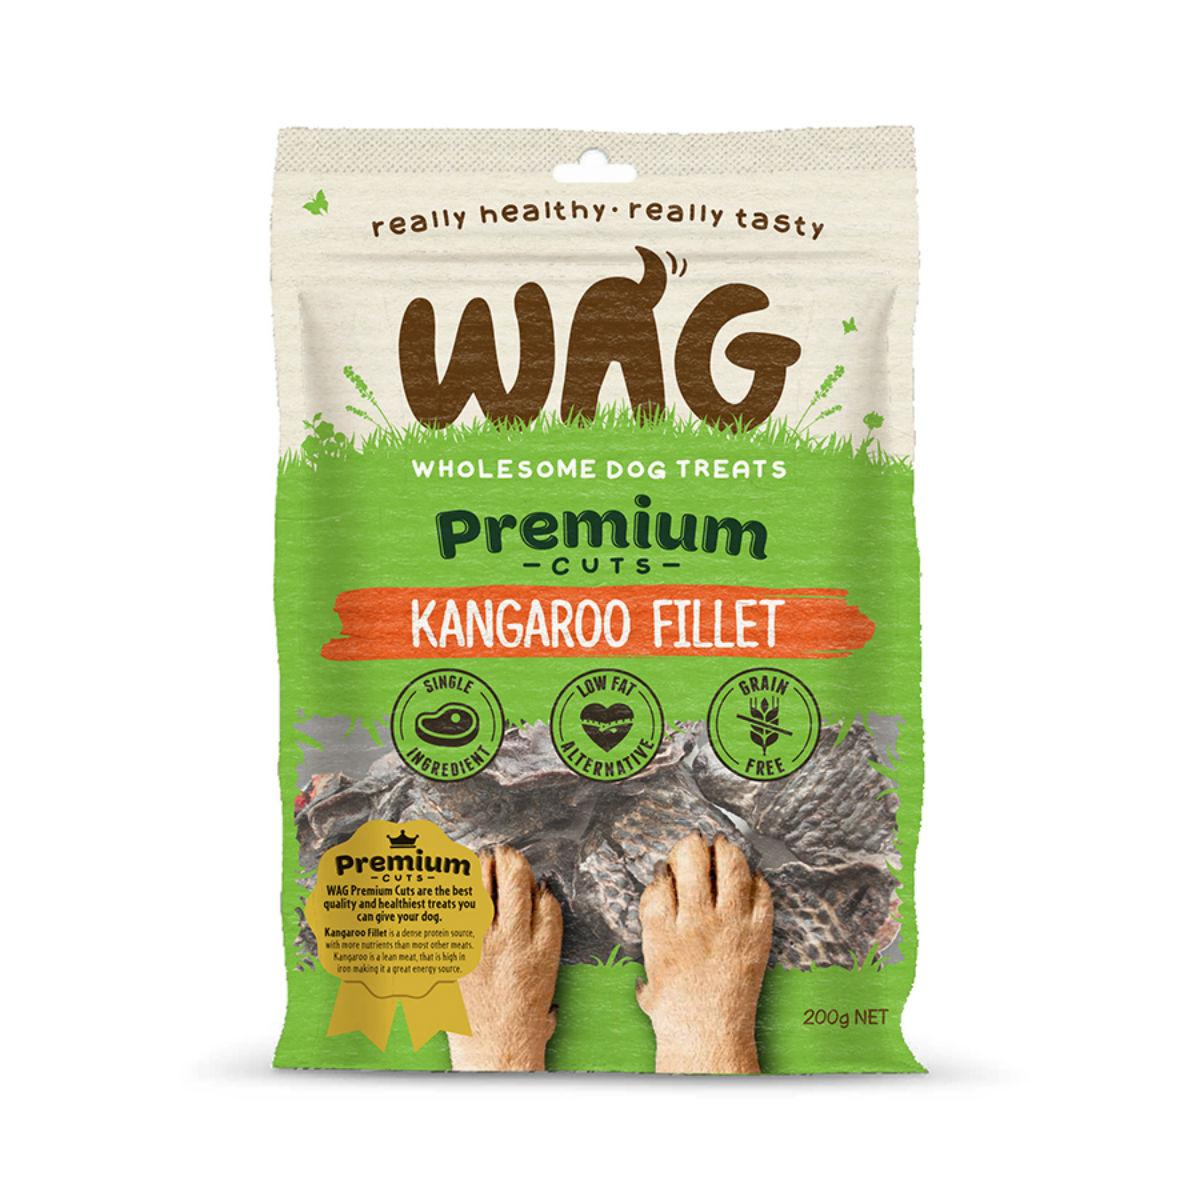 WAG Kangaroo Fillet Dog Jerky Treats